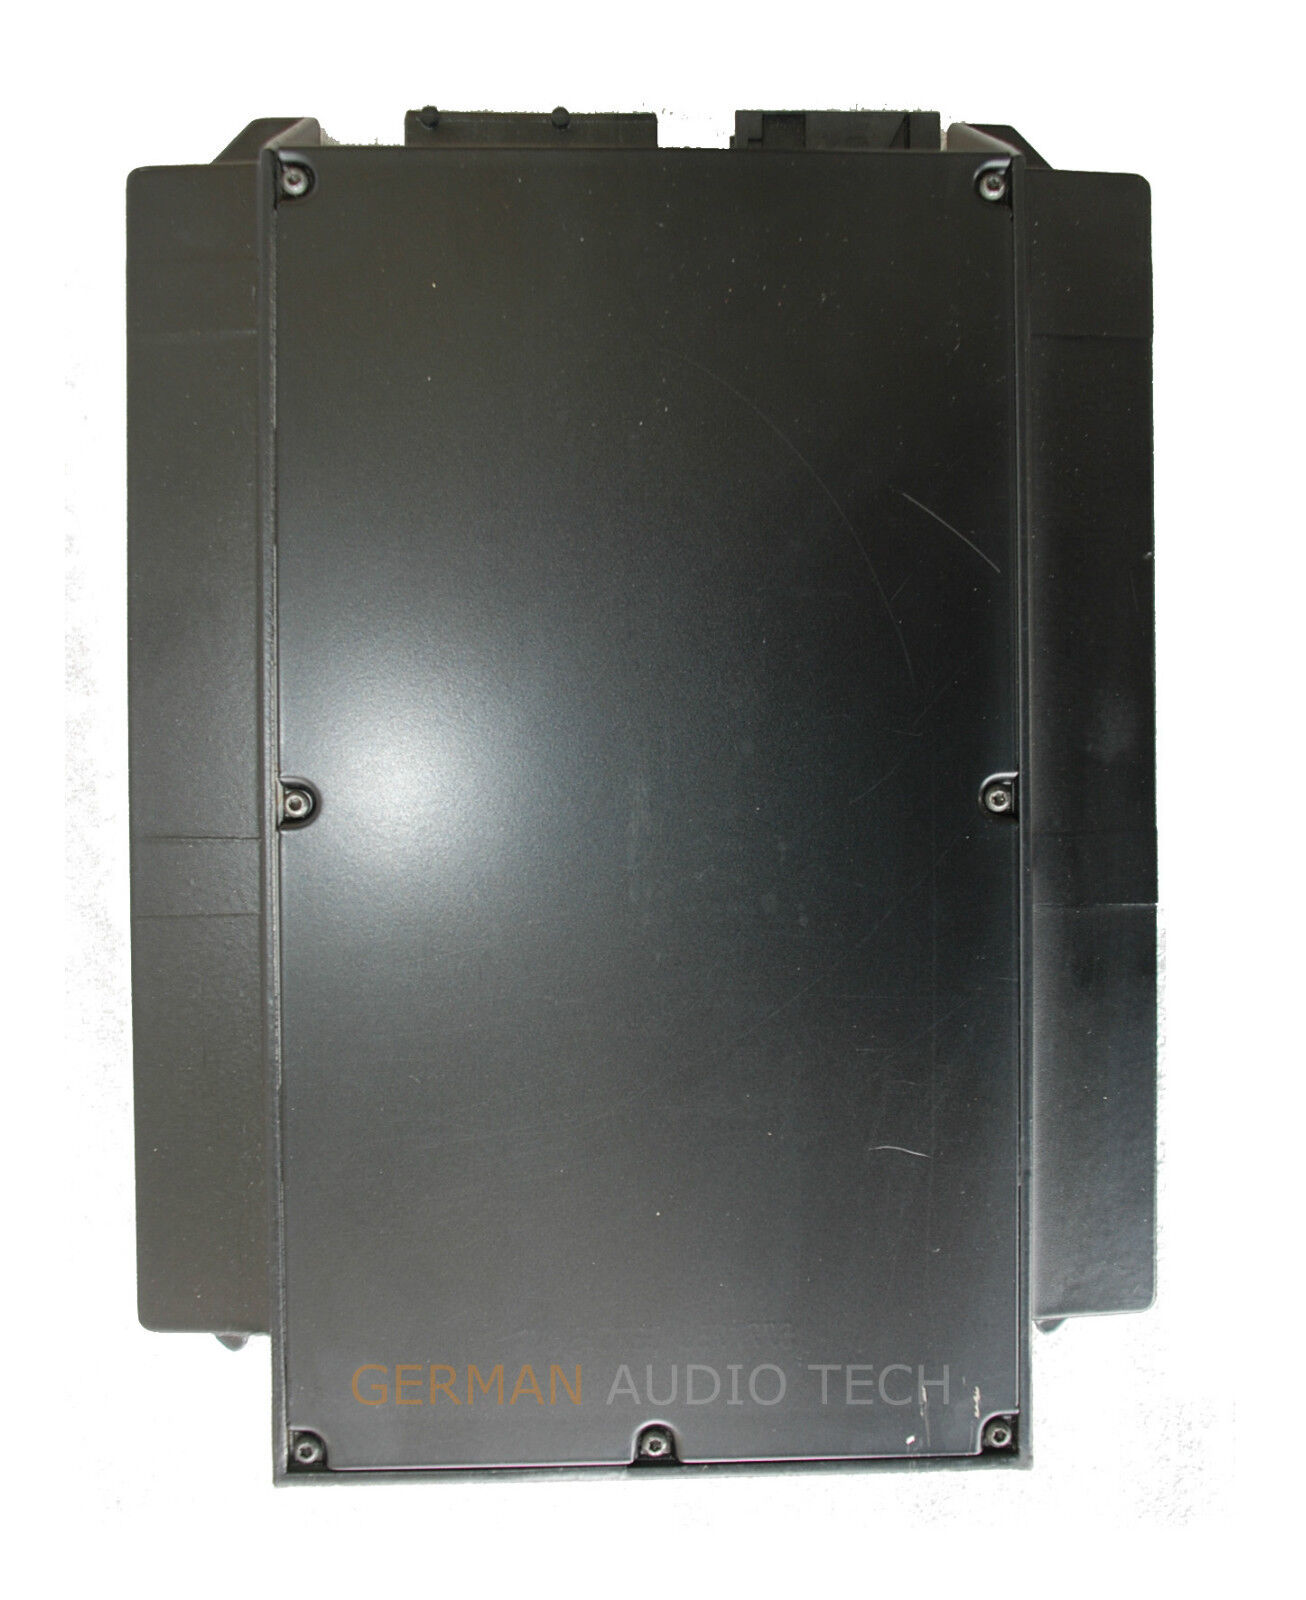 bmw dsp amplifier nav amp e38 740i 750 e39 525i 530i 540i. Black Bedroom Furniture Sets. Home Design Ideas